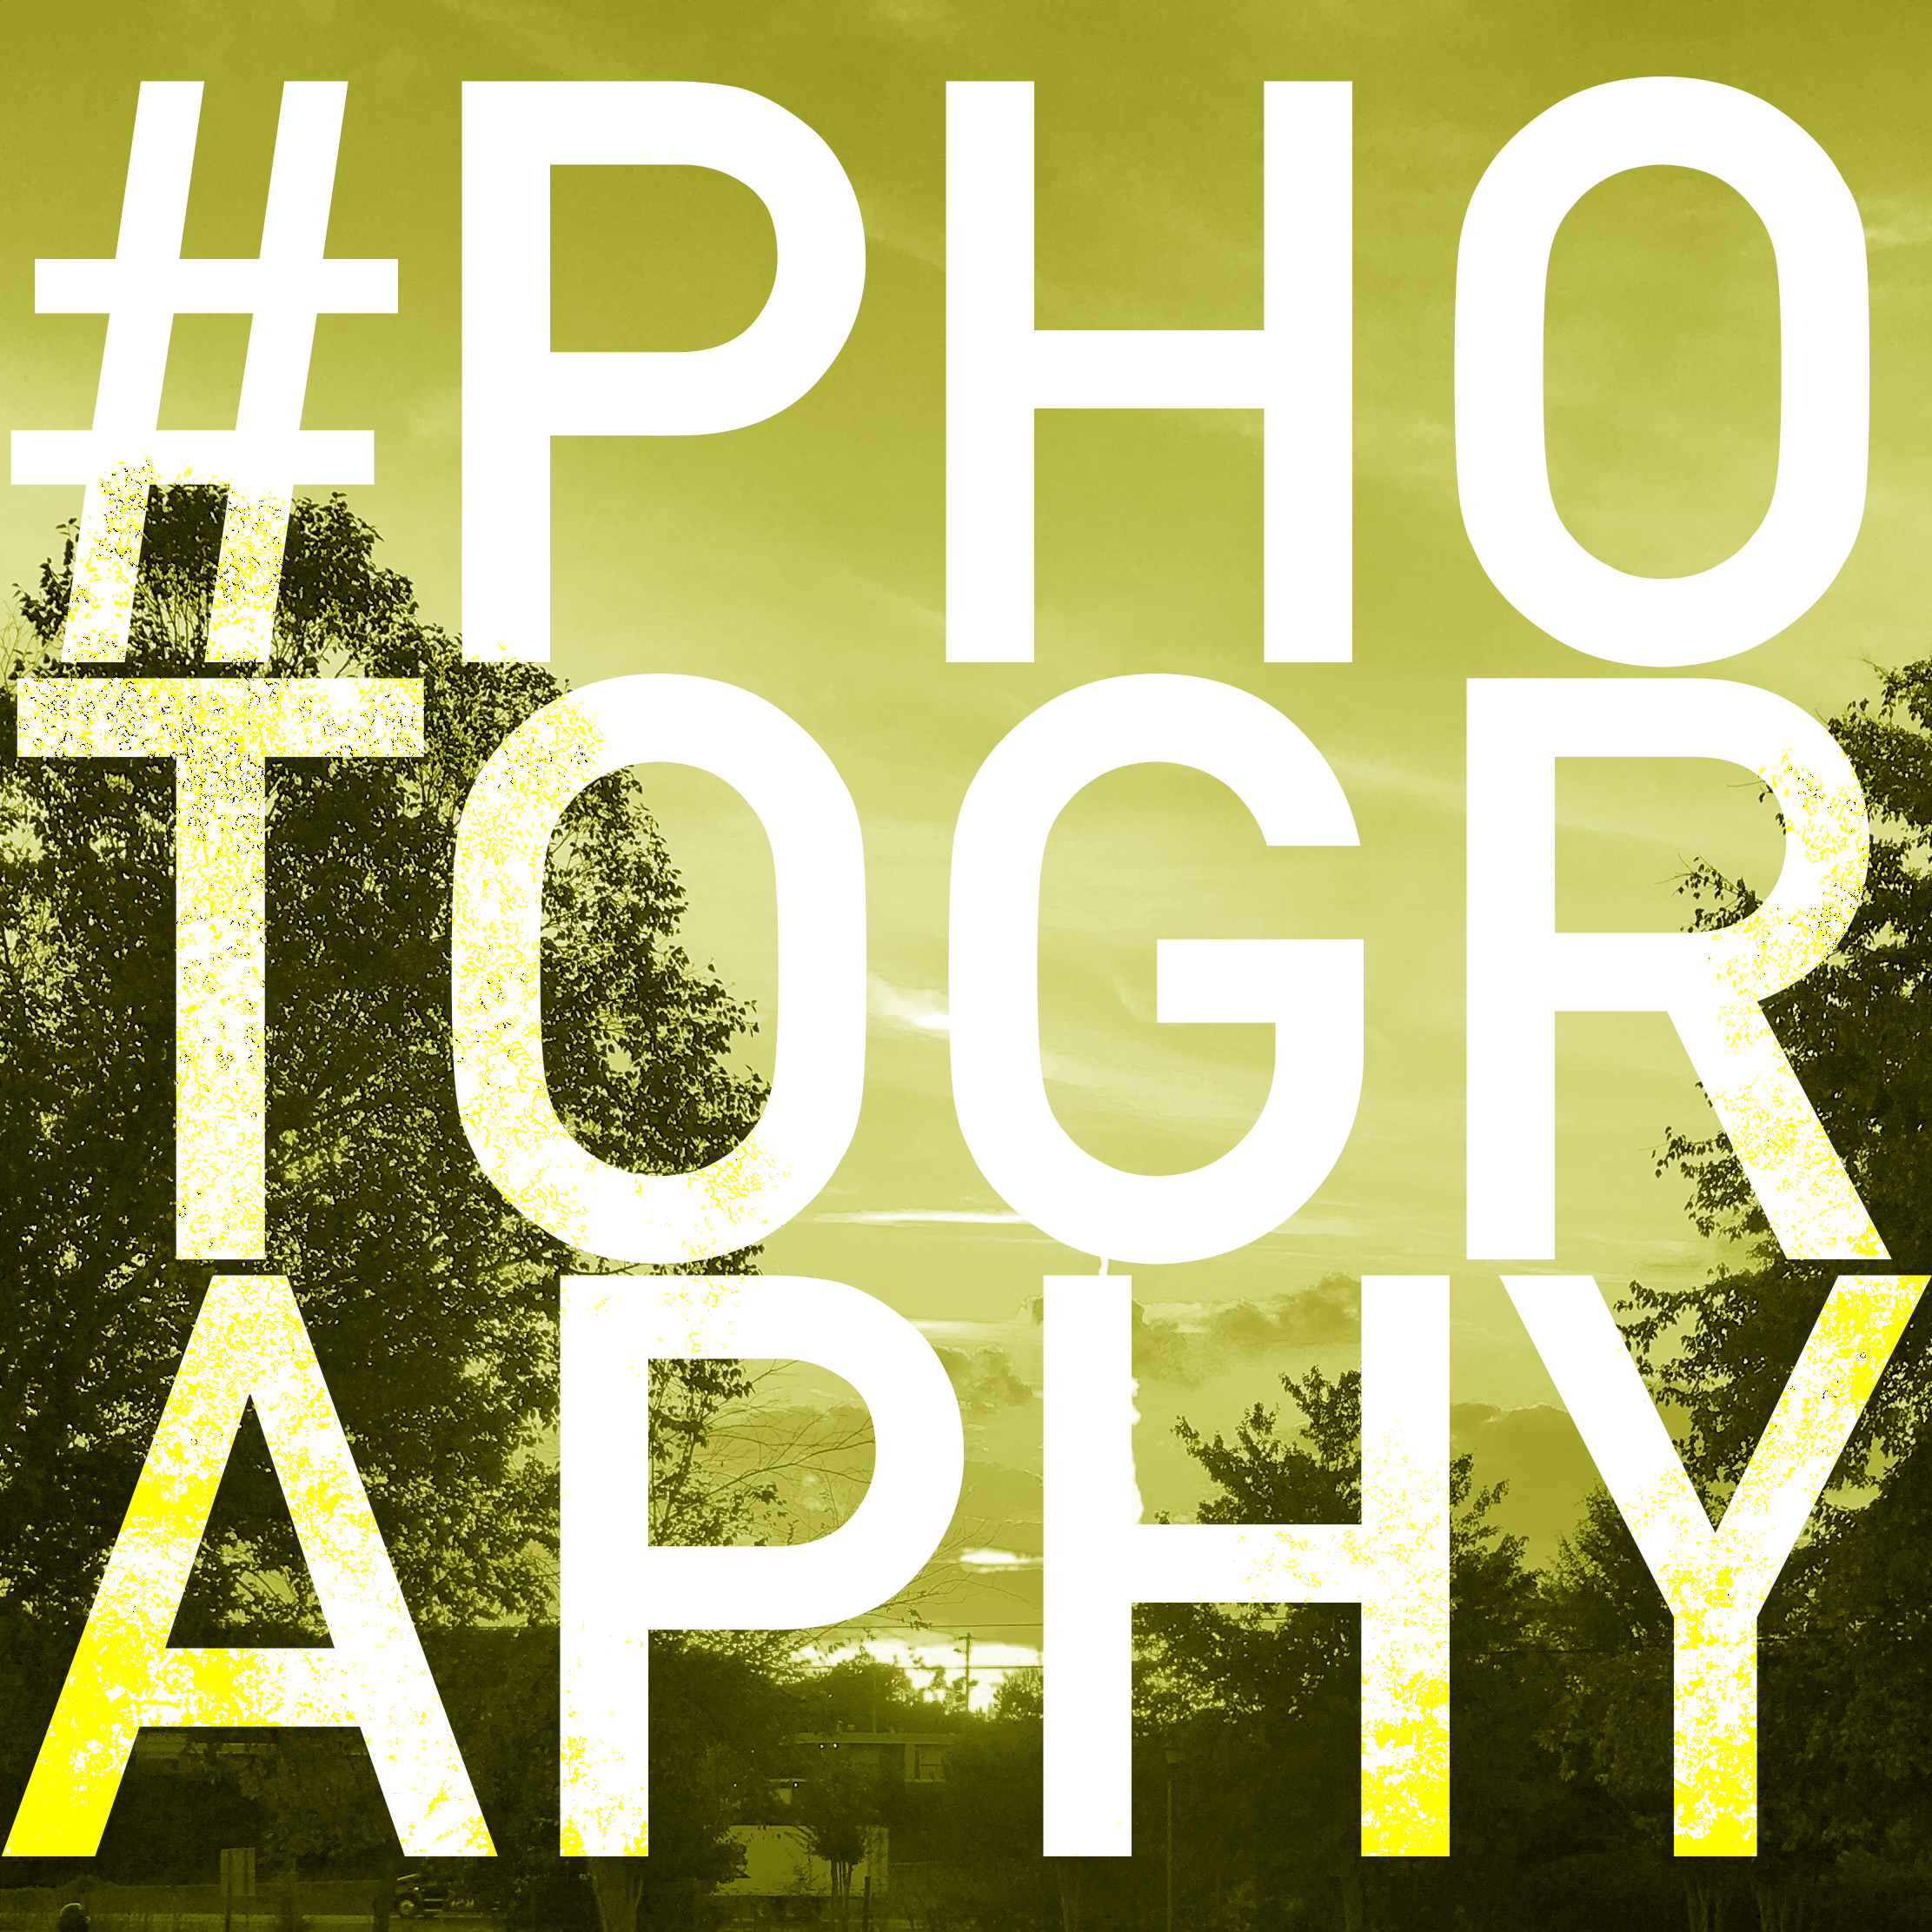 iogd photography img